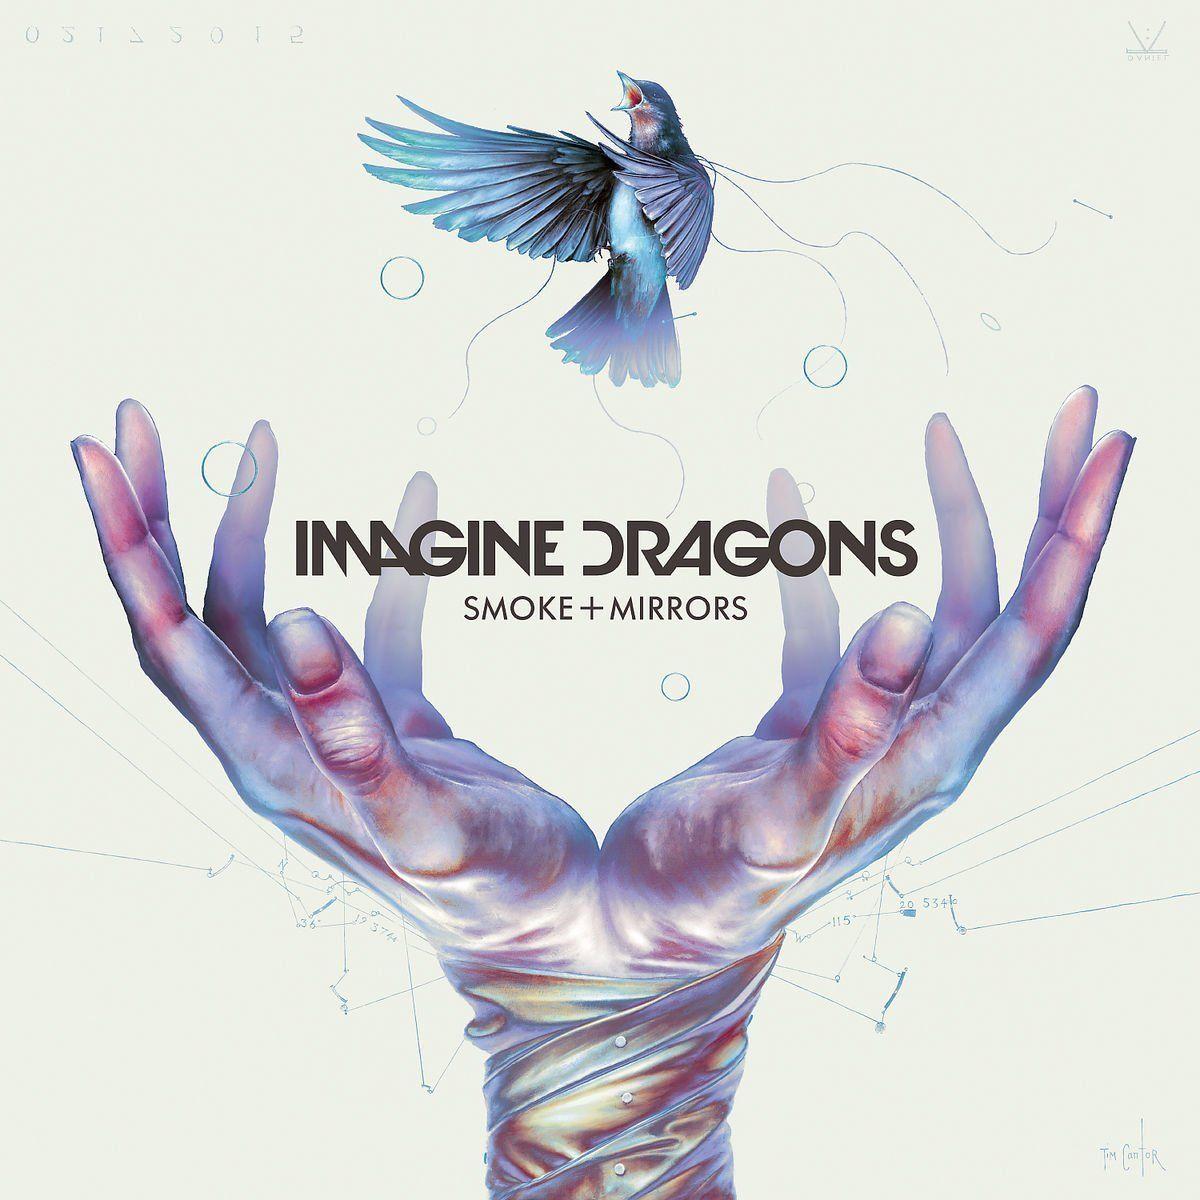 Imagine Dragons - Smoke + Mirrors album cover